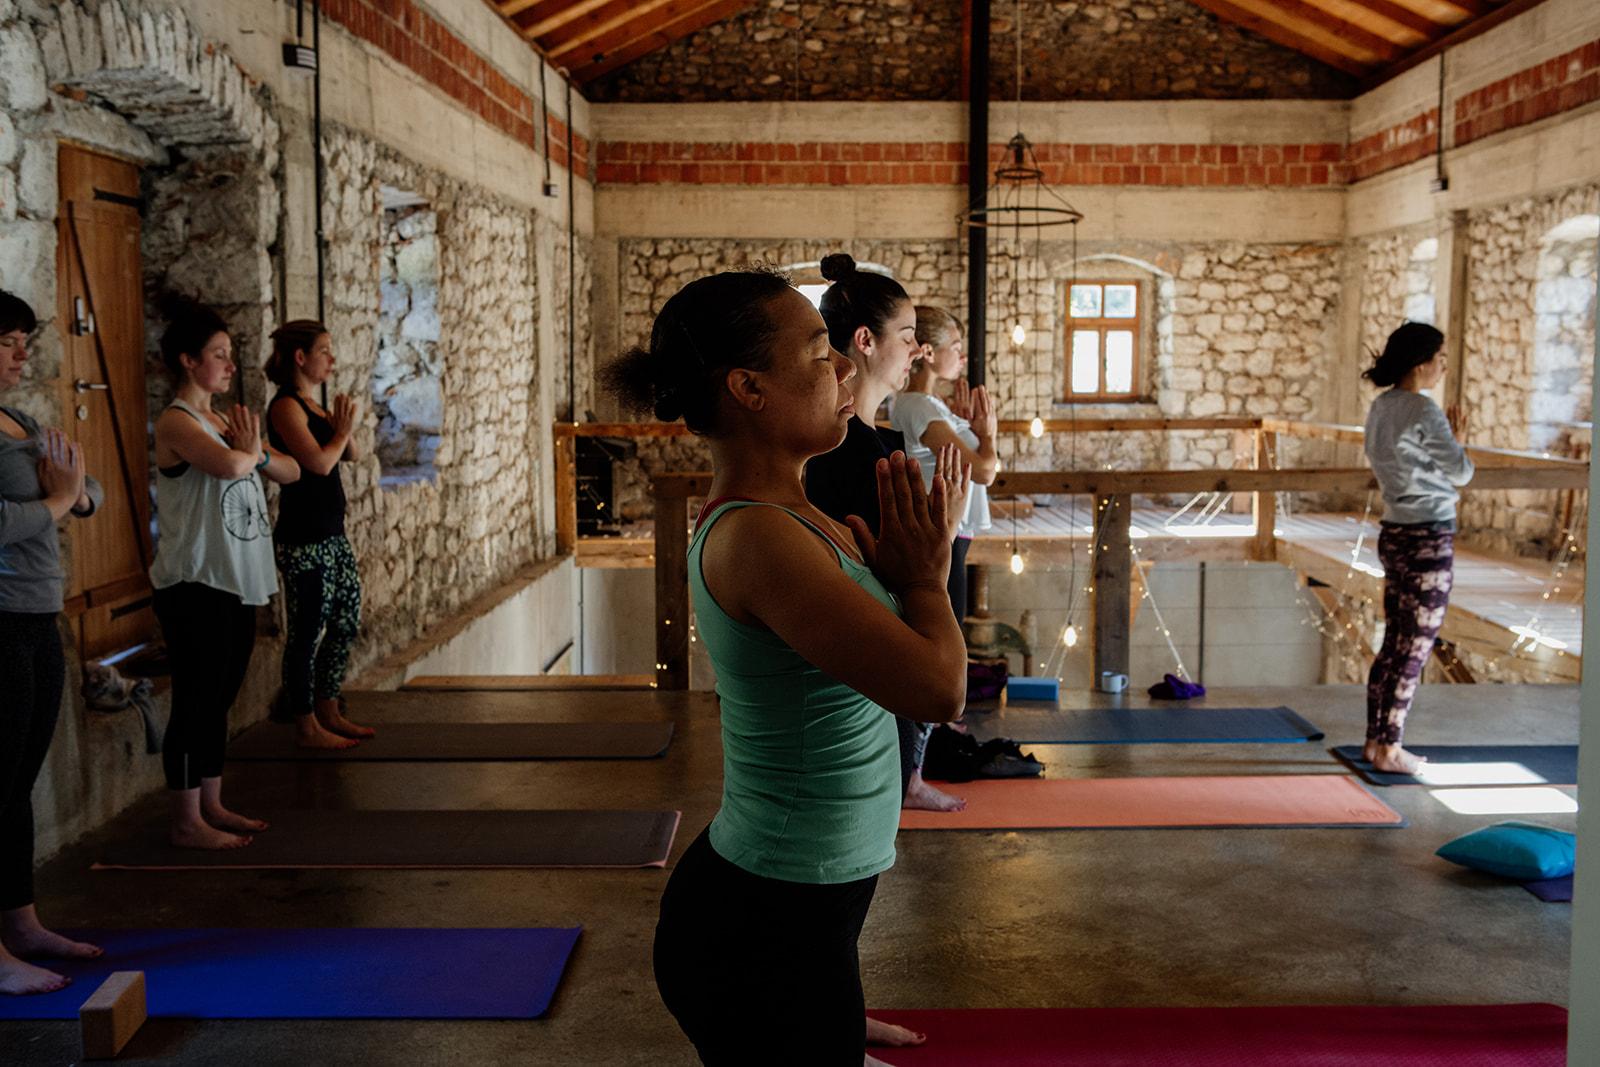 tadasana hands in prayer in yoga space - yoga holiday montenegro